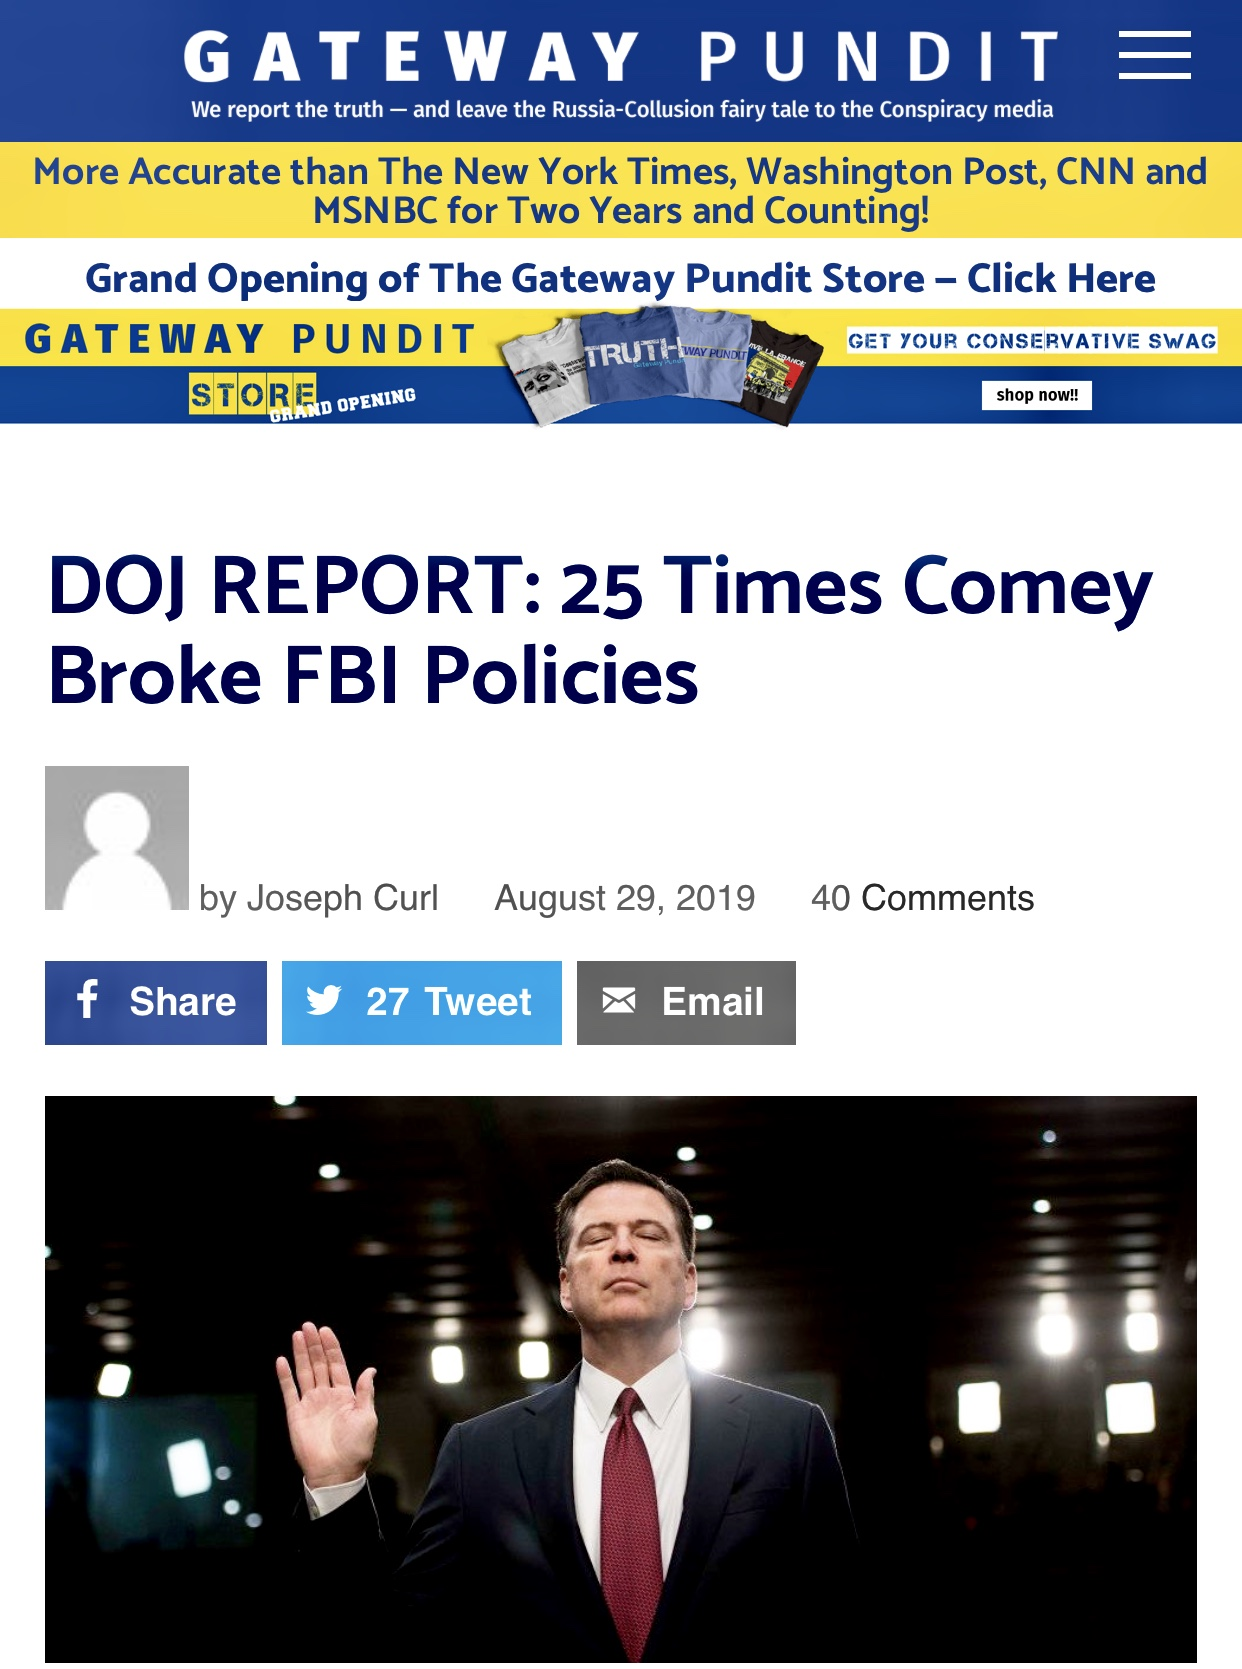 DOJ REPORT: 25 Times Comey Broke FBI Policies